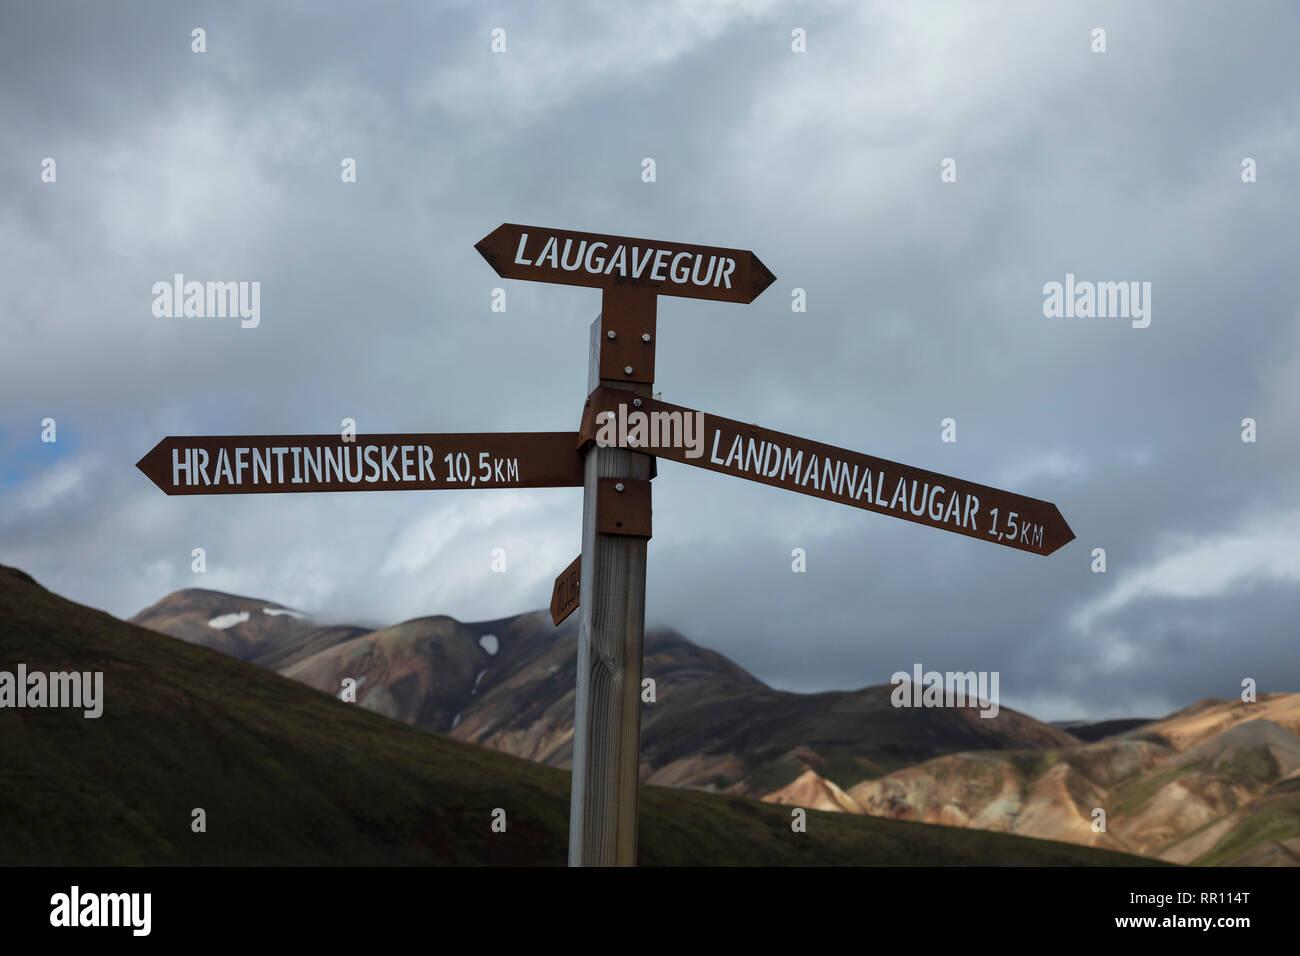 Hiking signpost marking the Laugavegur trail near Landmannalaugar. Central Highlands, Sudhurland, Iceland. - Stock Image